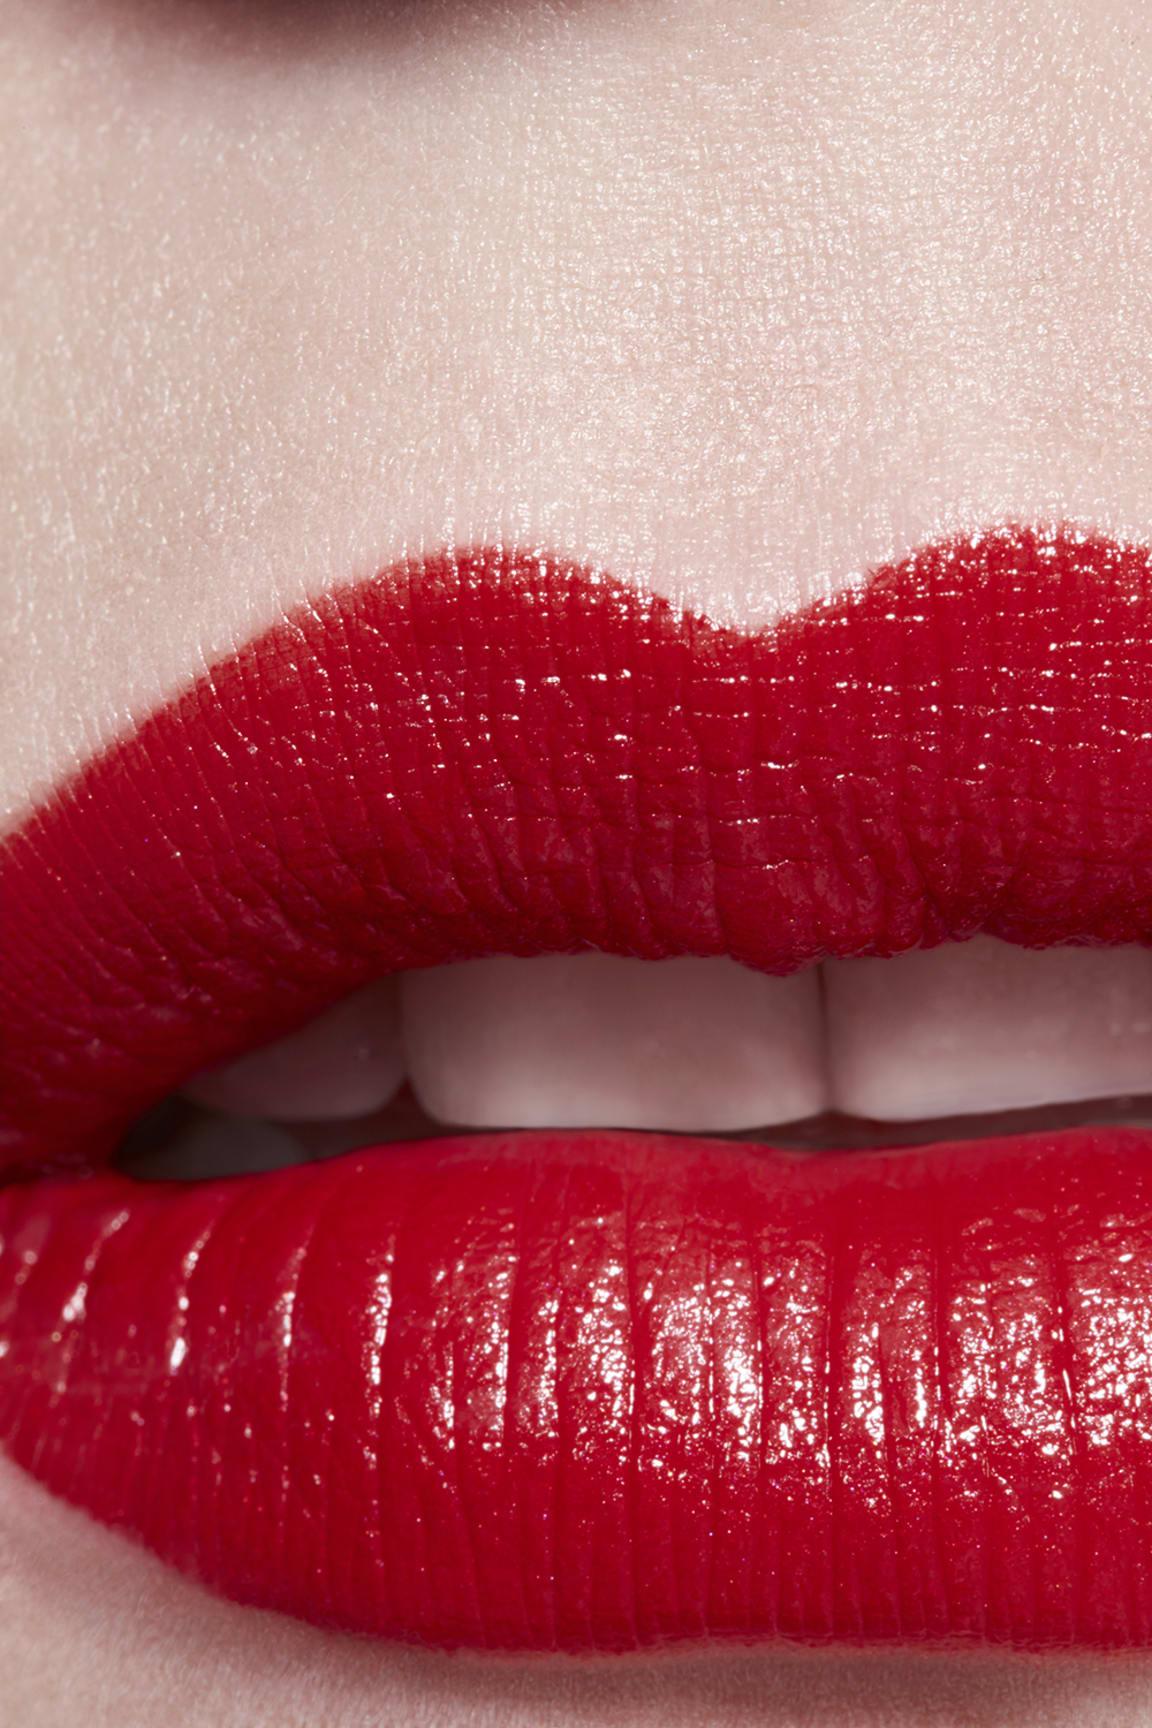 Application makeup visual 3 - ROUGE ALLURE 98 - COROMANDEL